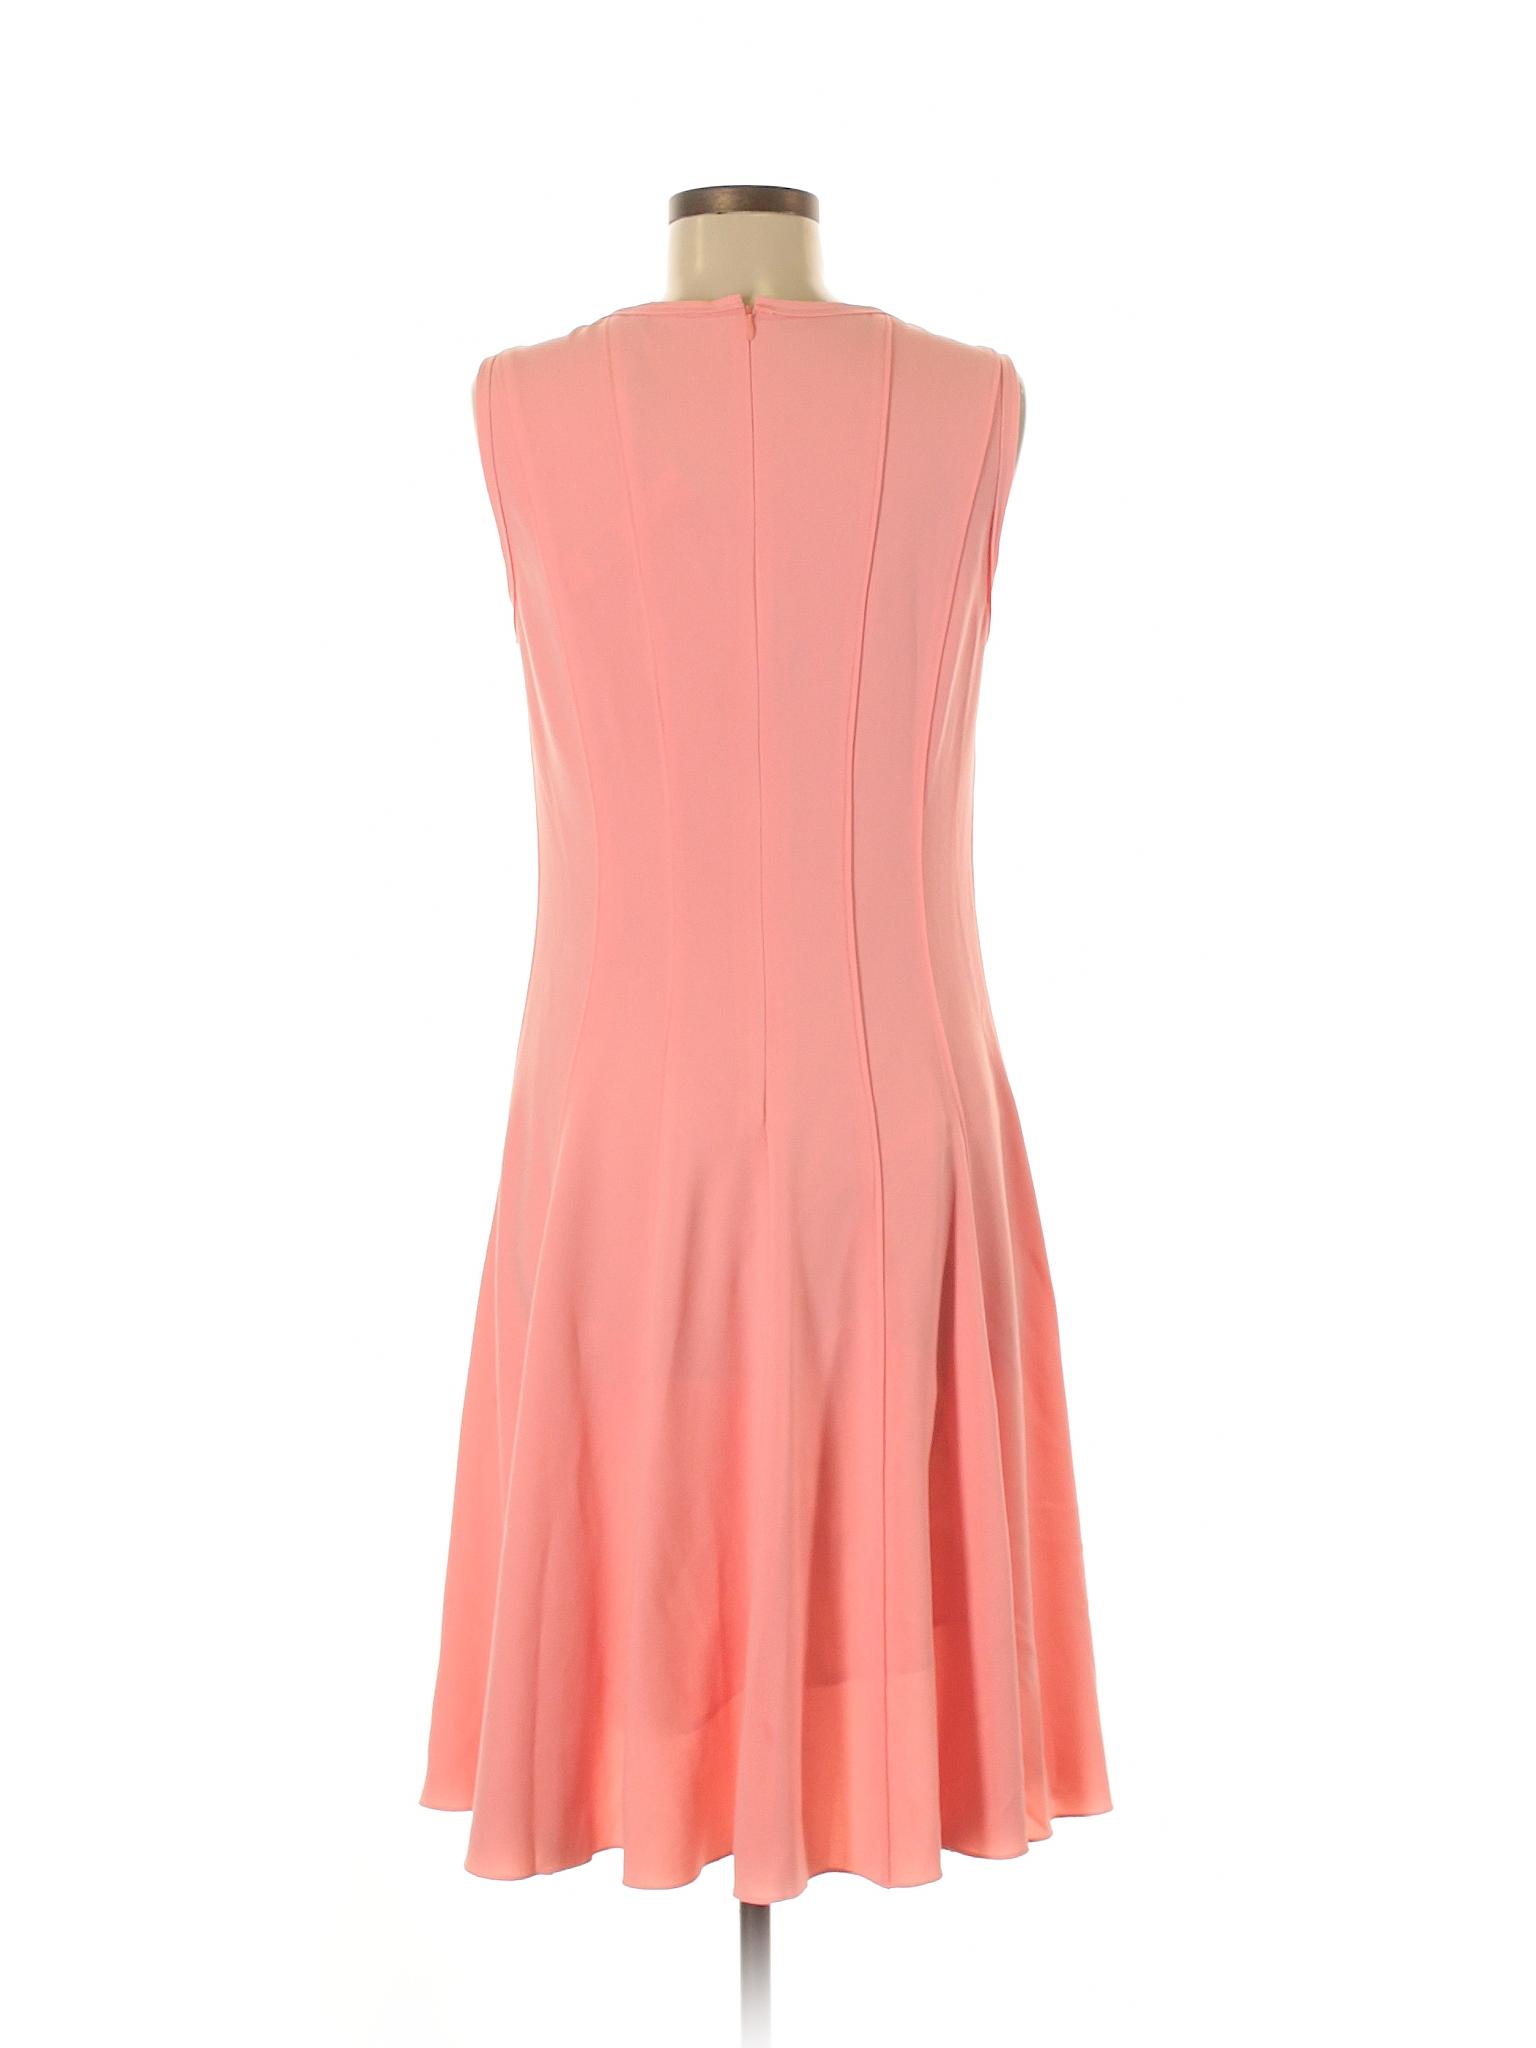 Casual Boutique Dress Elie winter Tahari TfqwFH1g